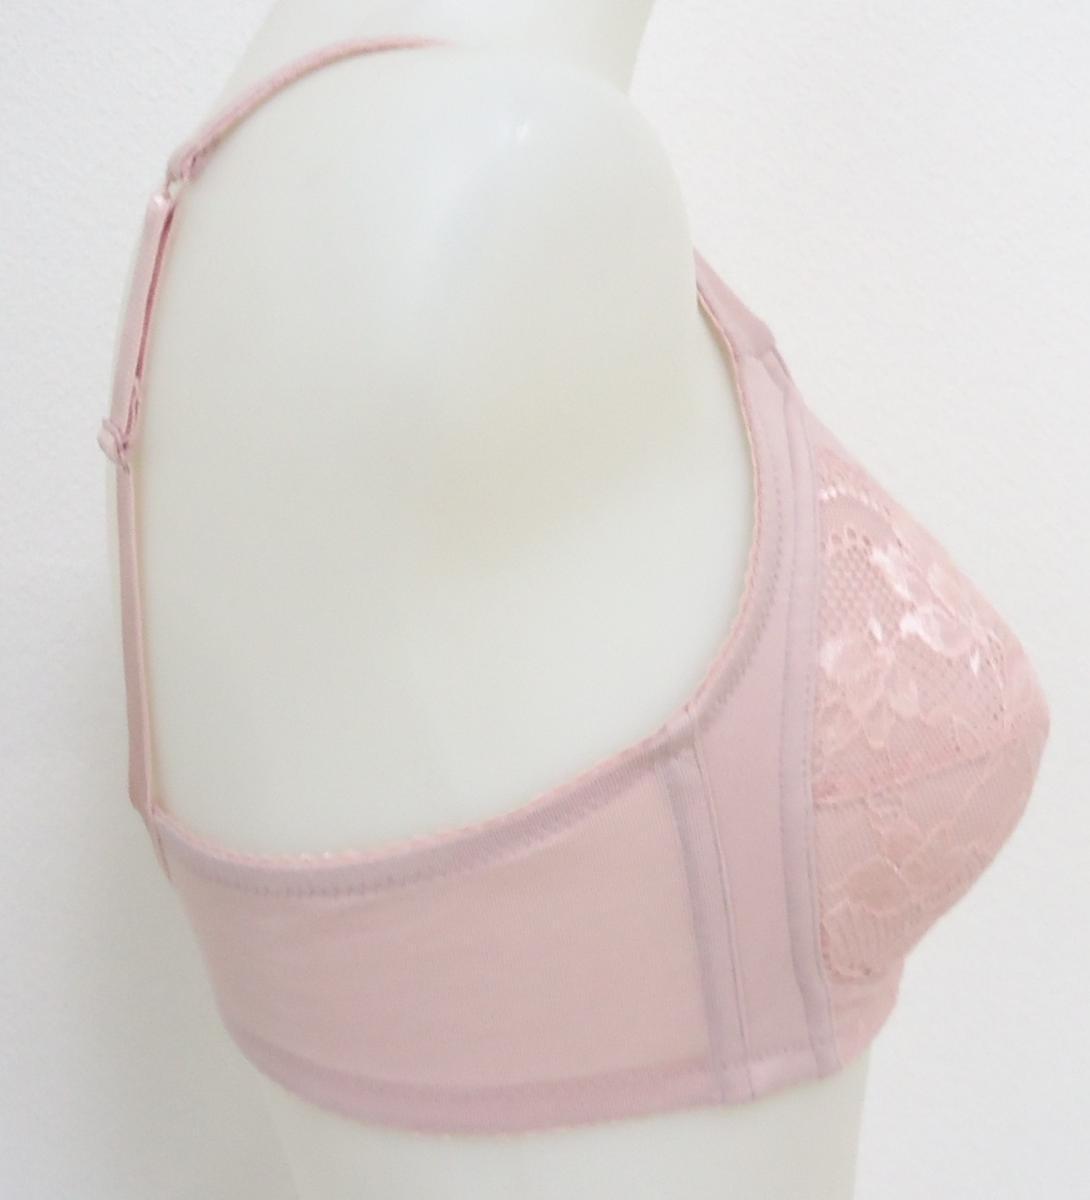 B80・ピンク◆フルカップノンワイヤーブラジャー◆綿混素材のやさしい着用感♪ 《やわらか素材》《広幅ストラップ》【特価】【激安】_画像5